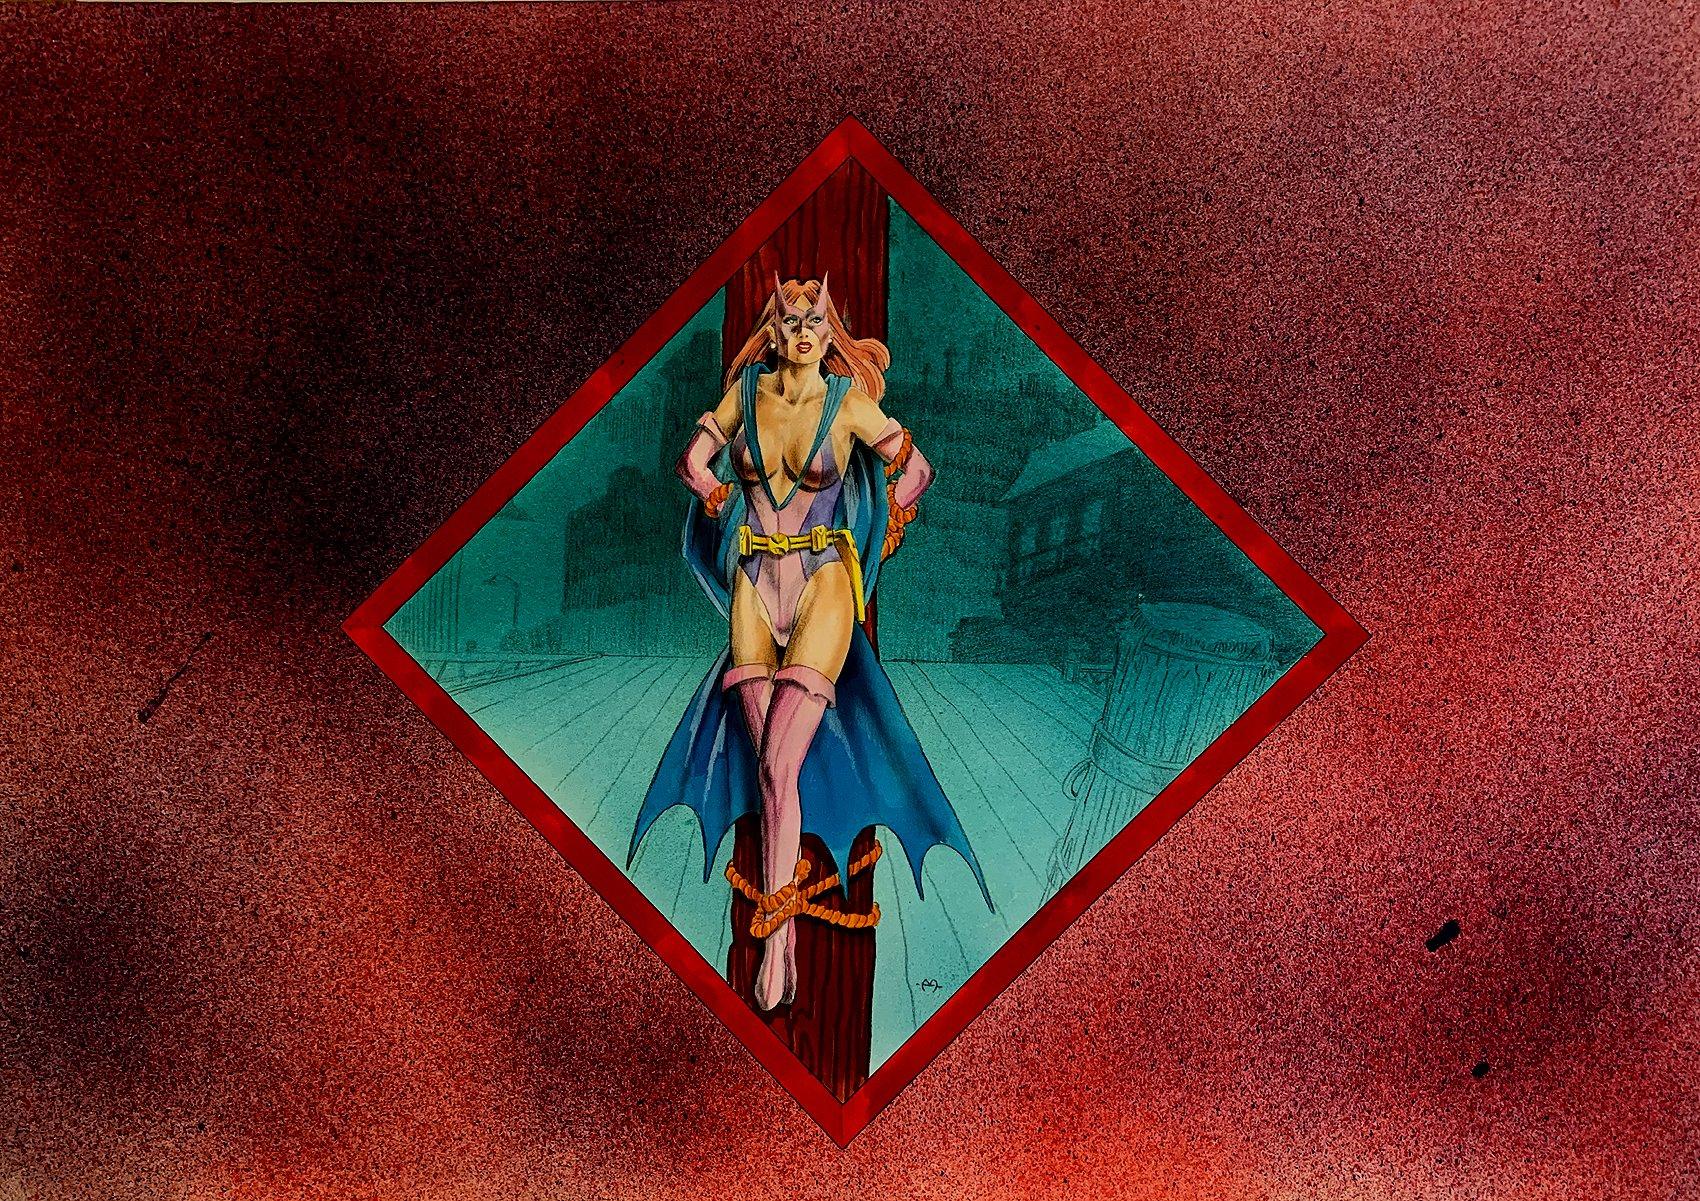 Huntress In Bondage Humongous Painting (1980s)